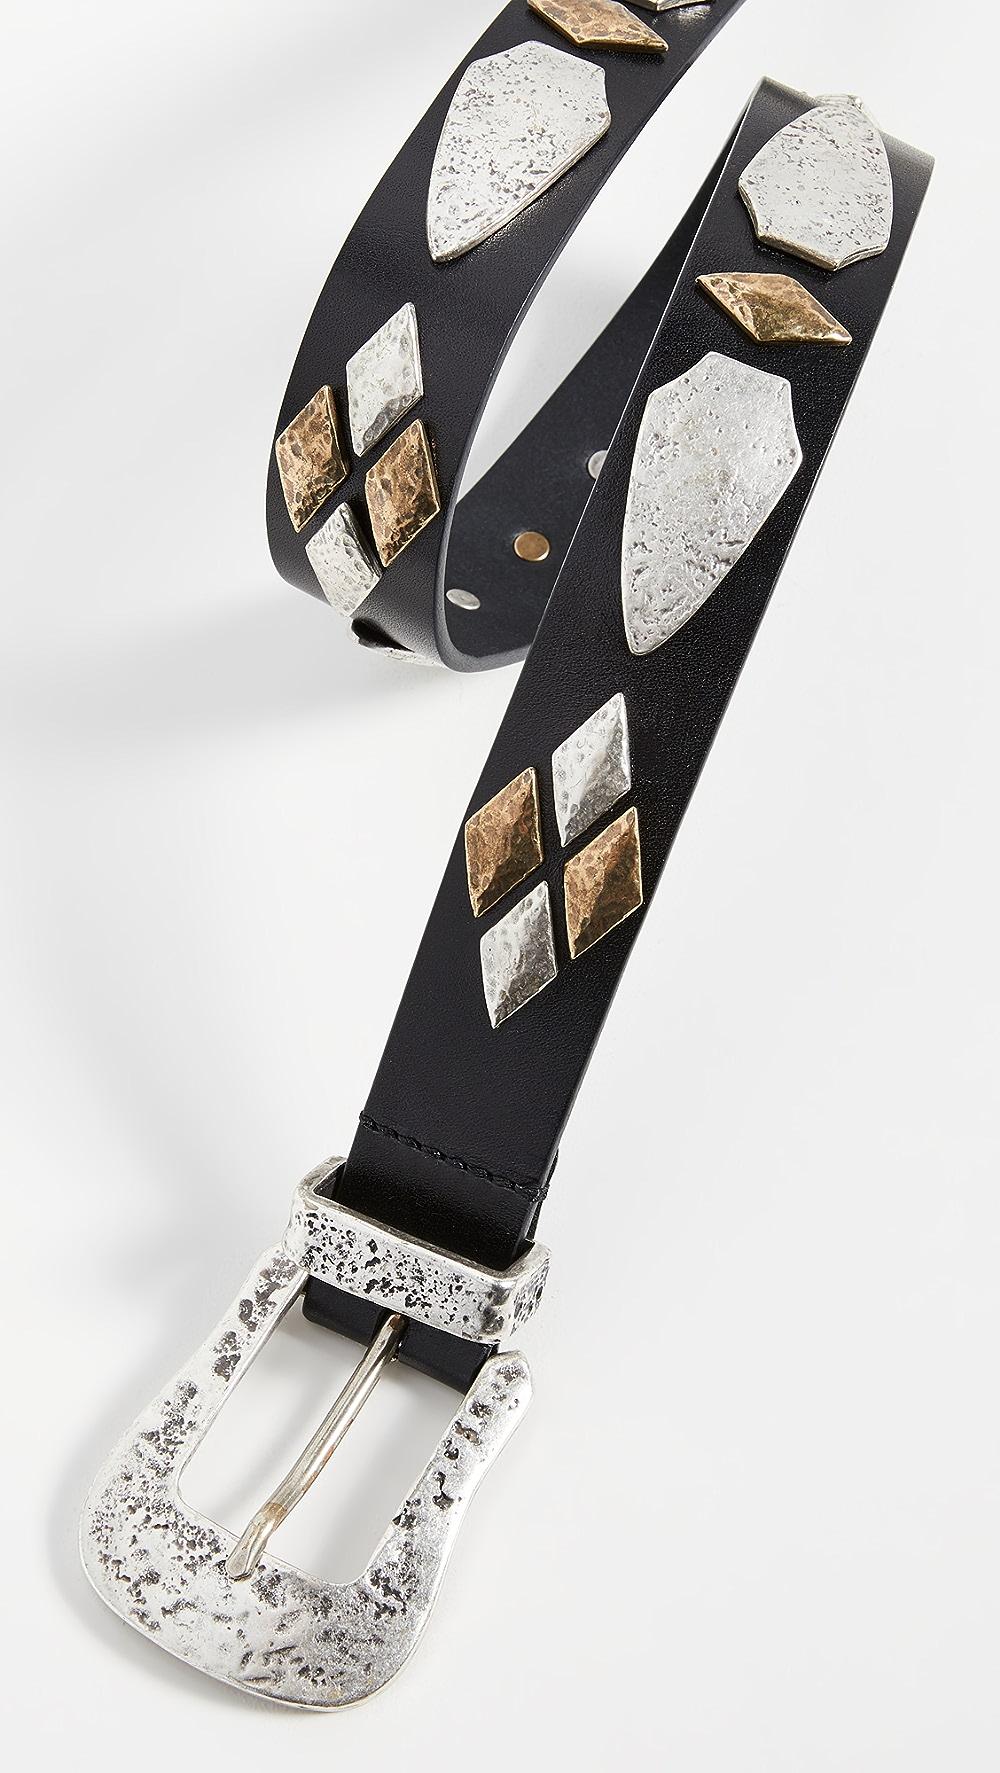 Charitable Isabel Marant - Dern Belt Attractive Designs;